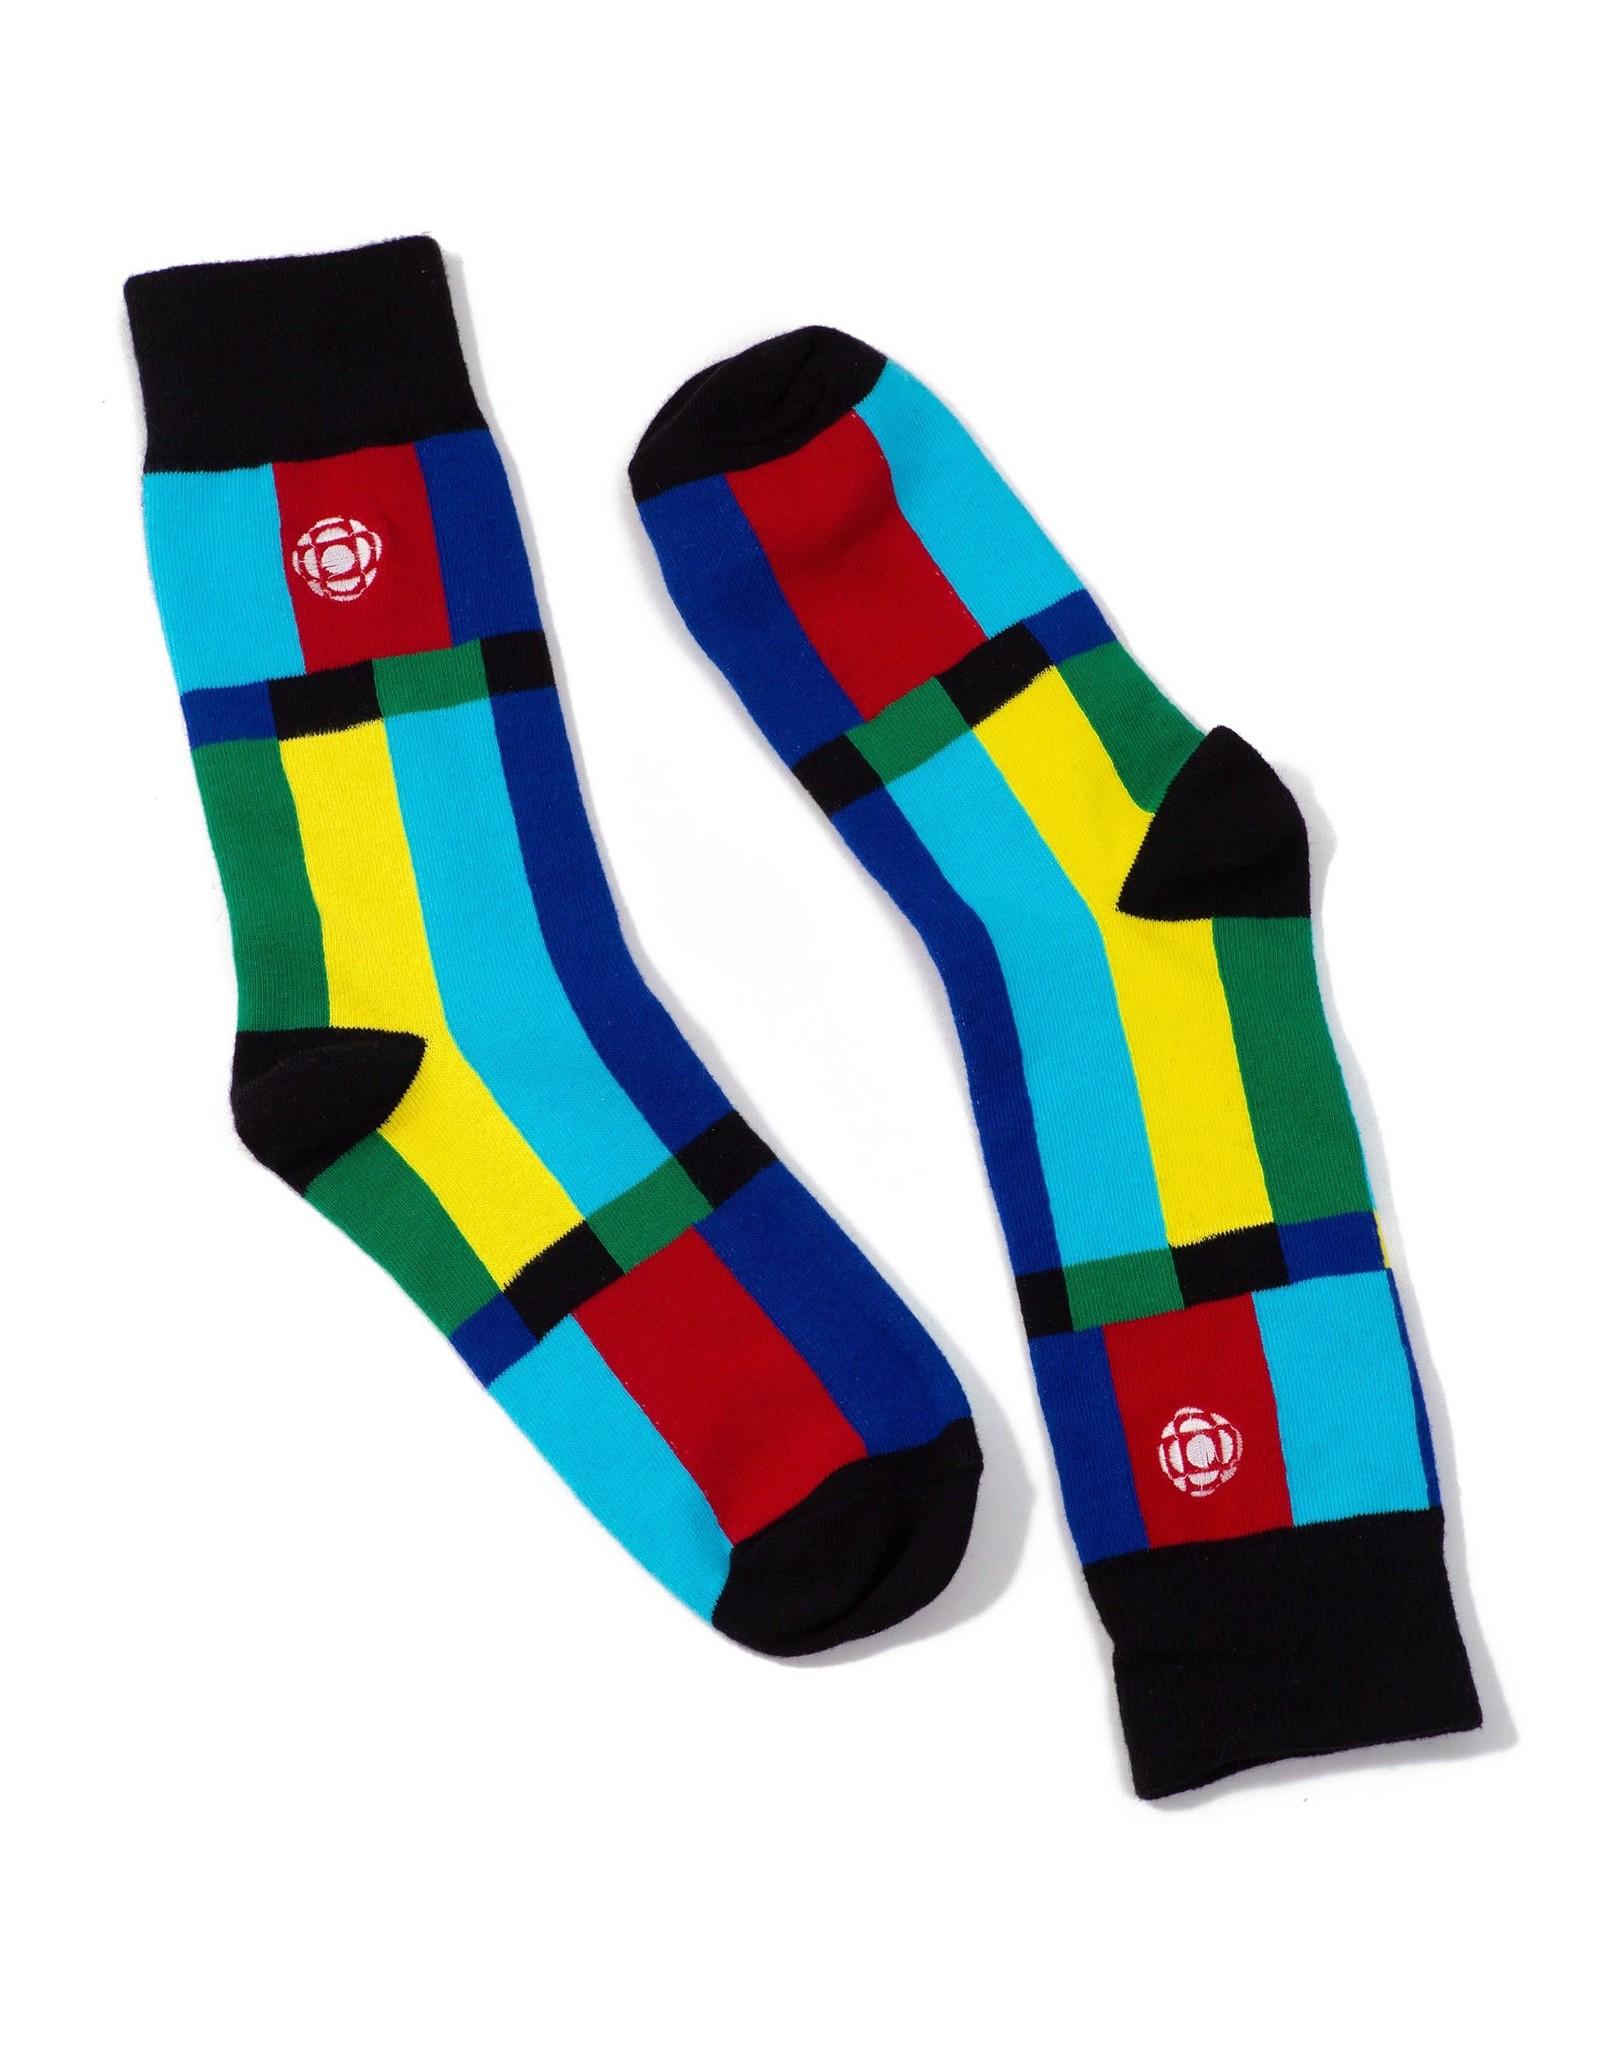 Main & Local CBC Standby Socks